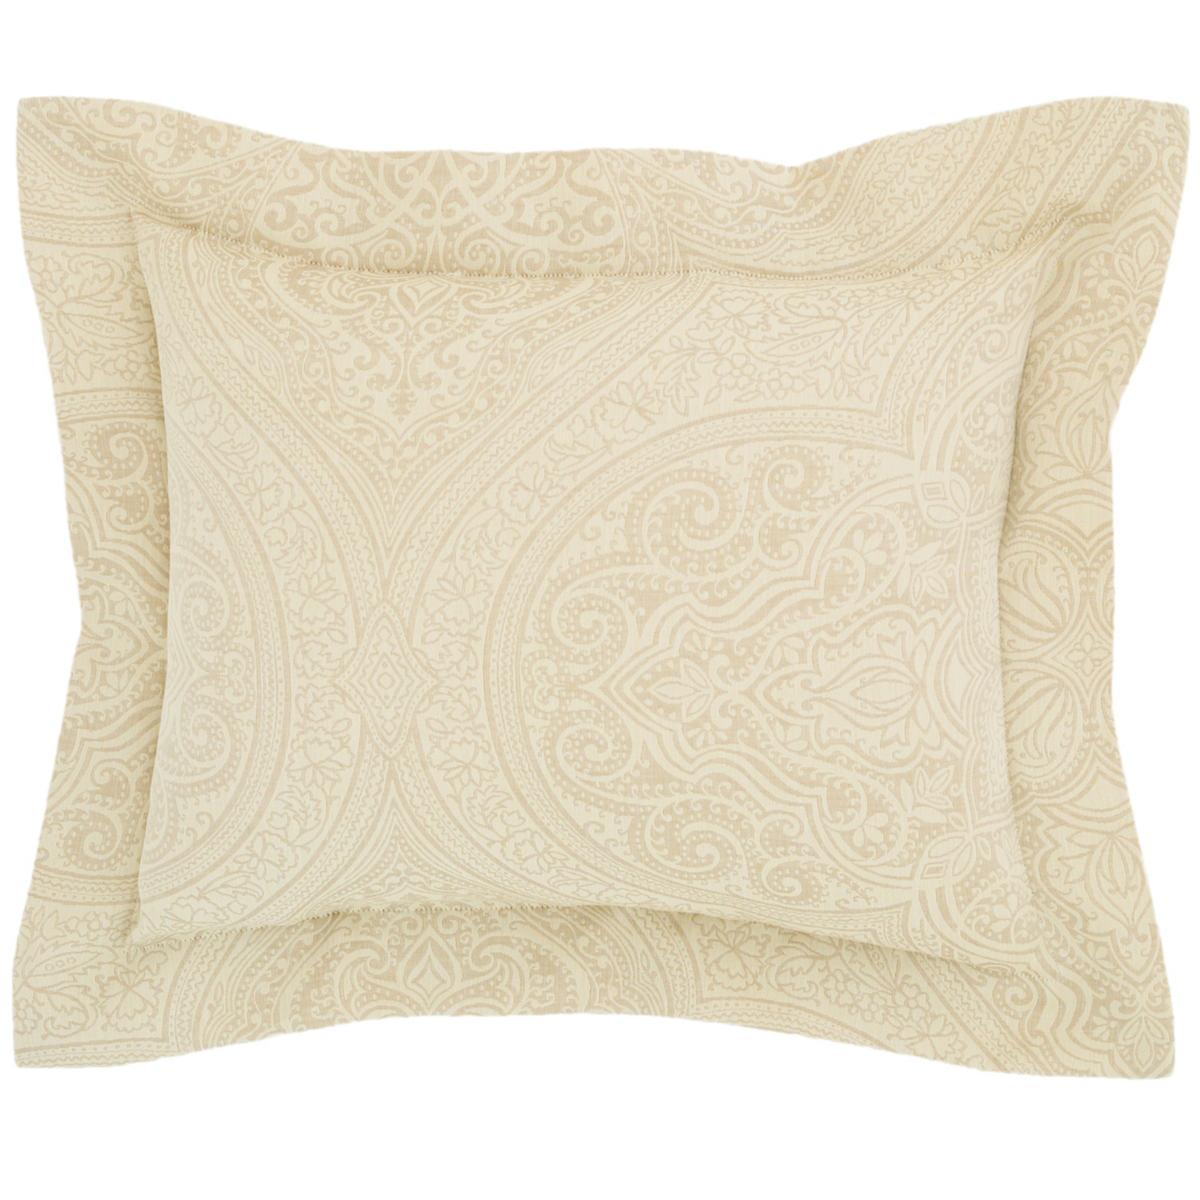 Firenze Sandstone Decorative Pillow